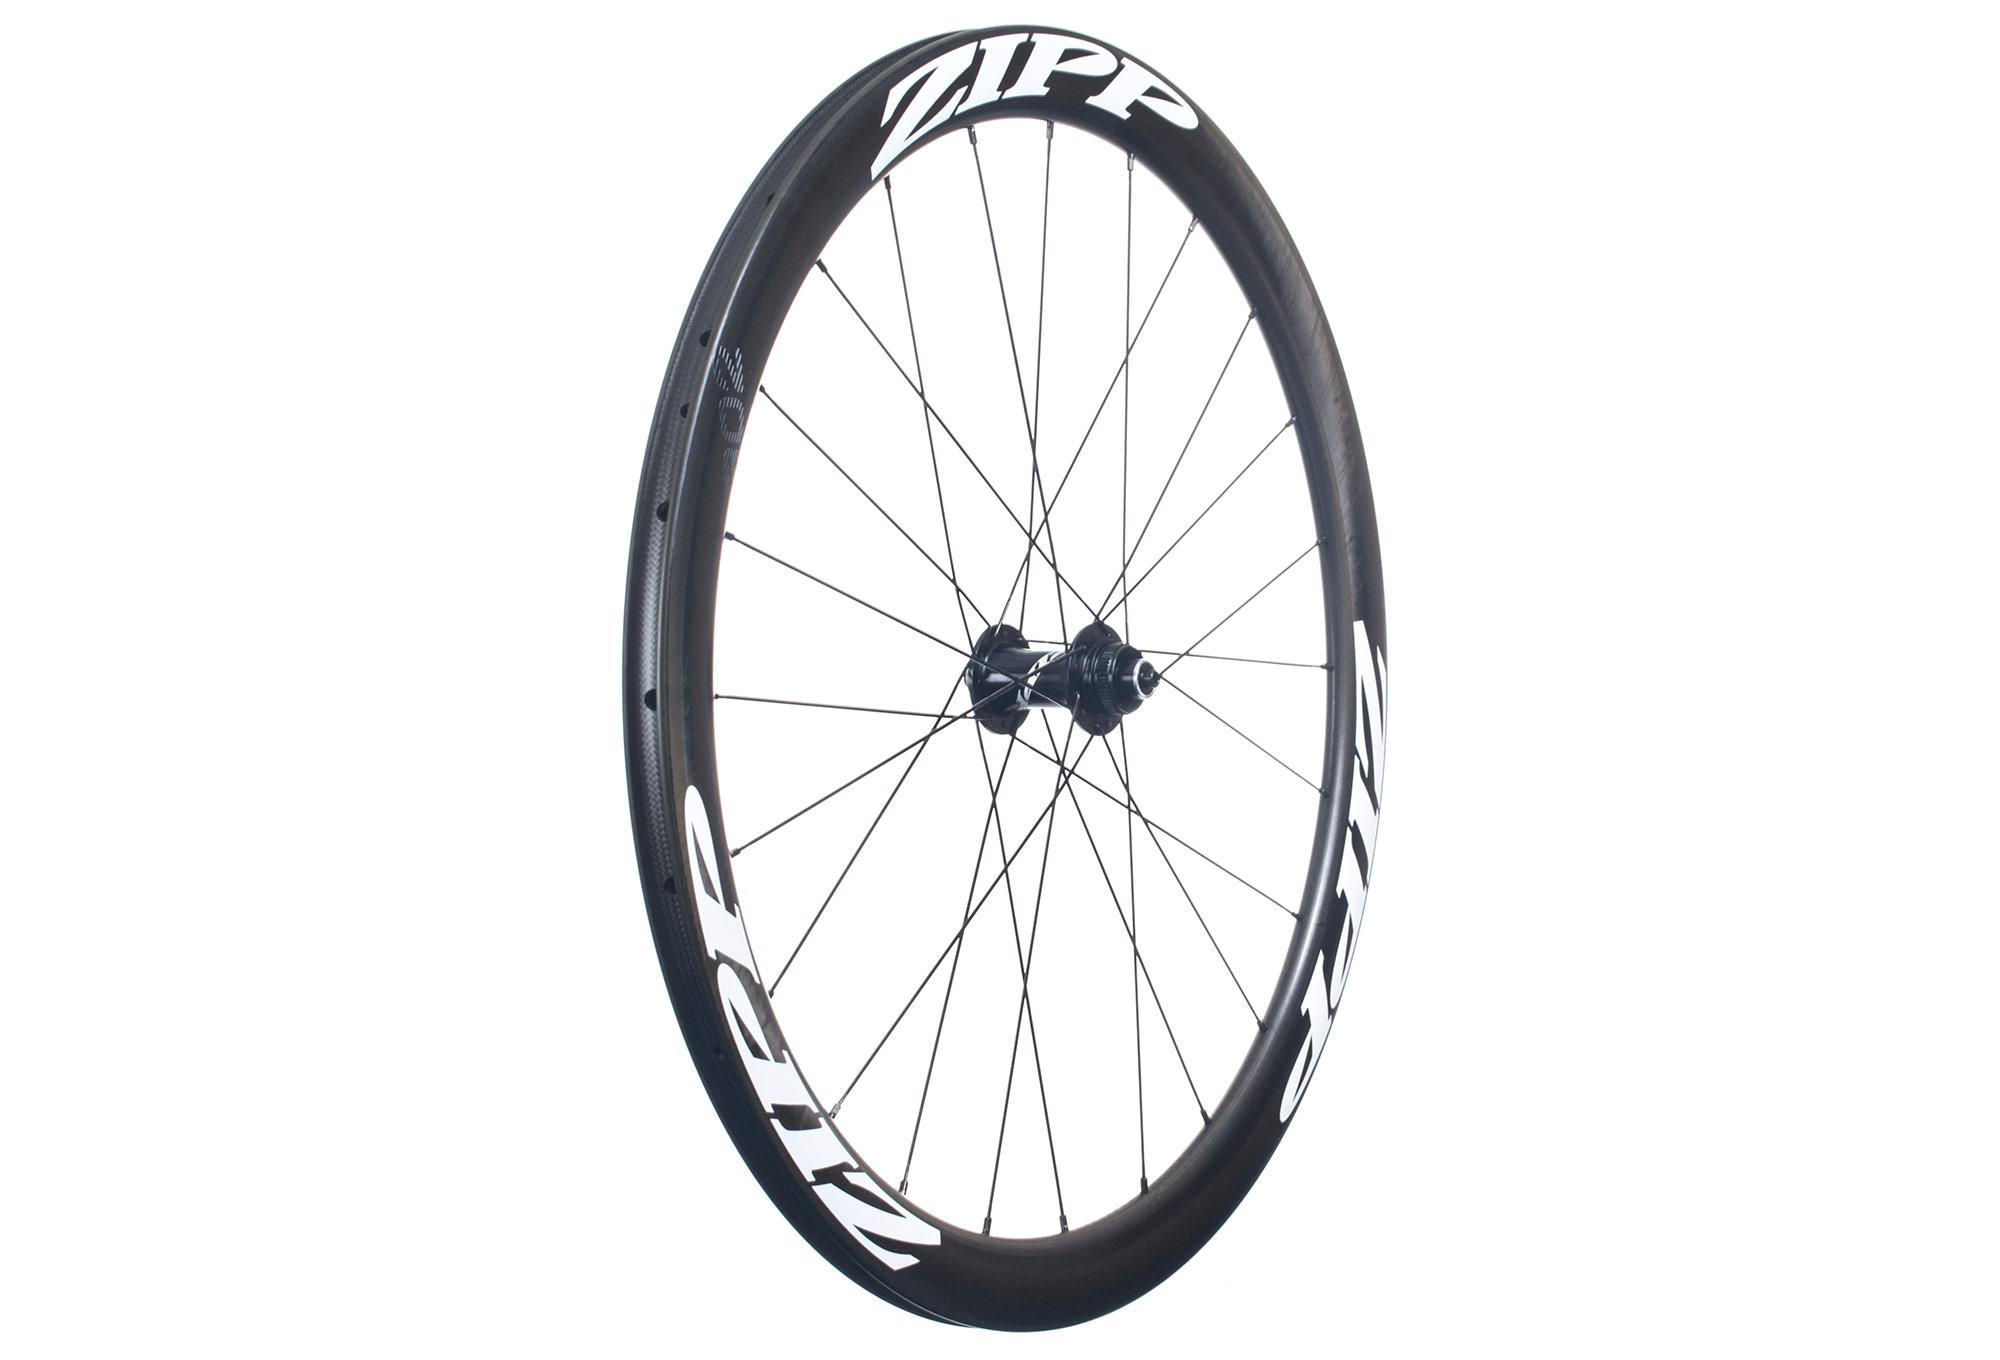 Front wheel zipp 302 disc carbon clincher qr 9 12 15mm black white decals alltricks com